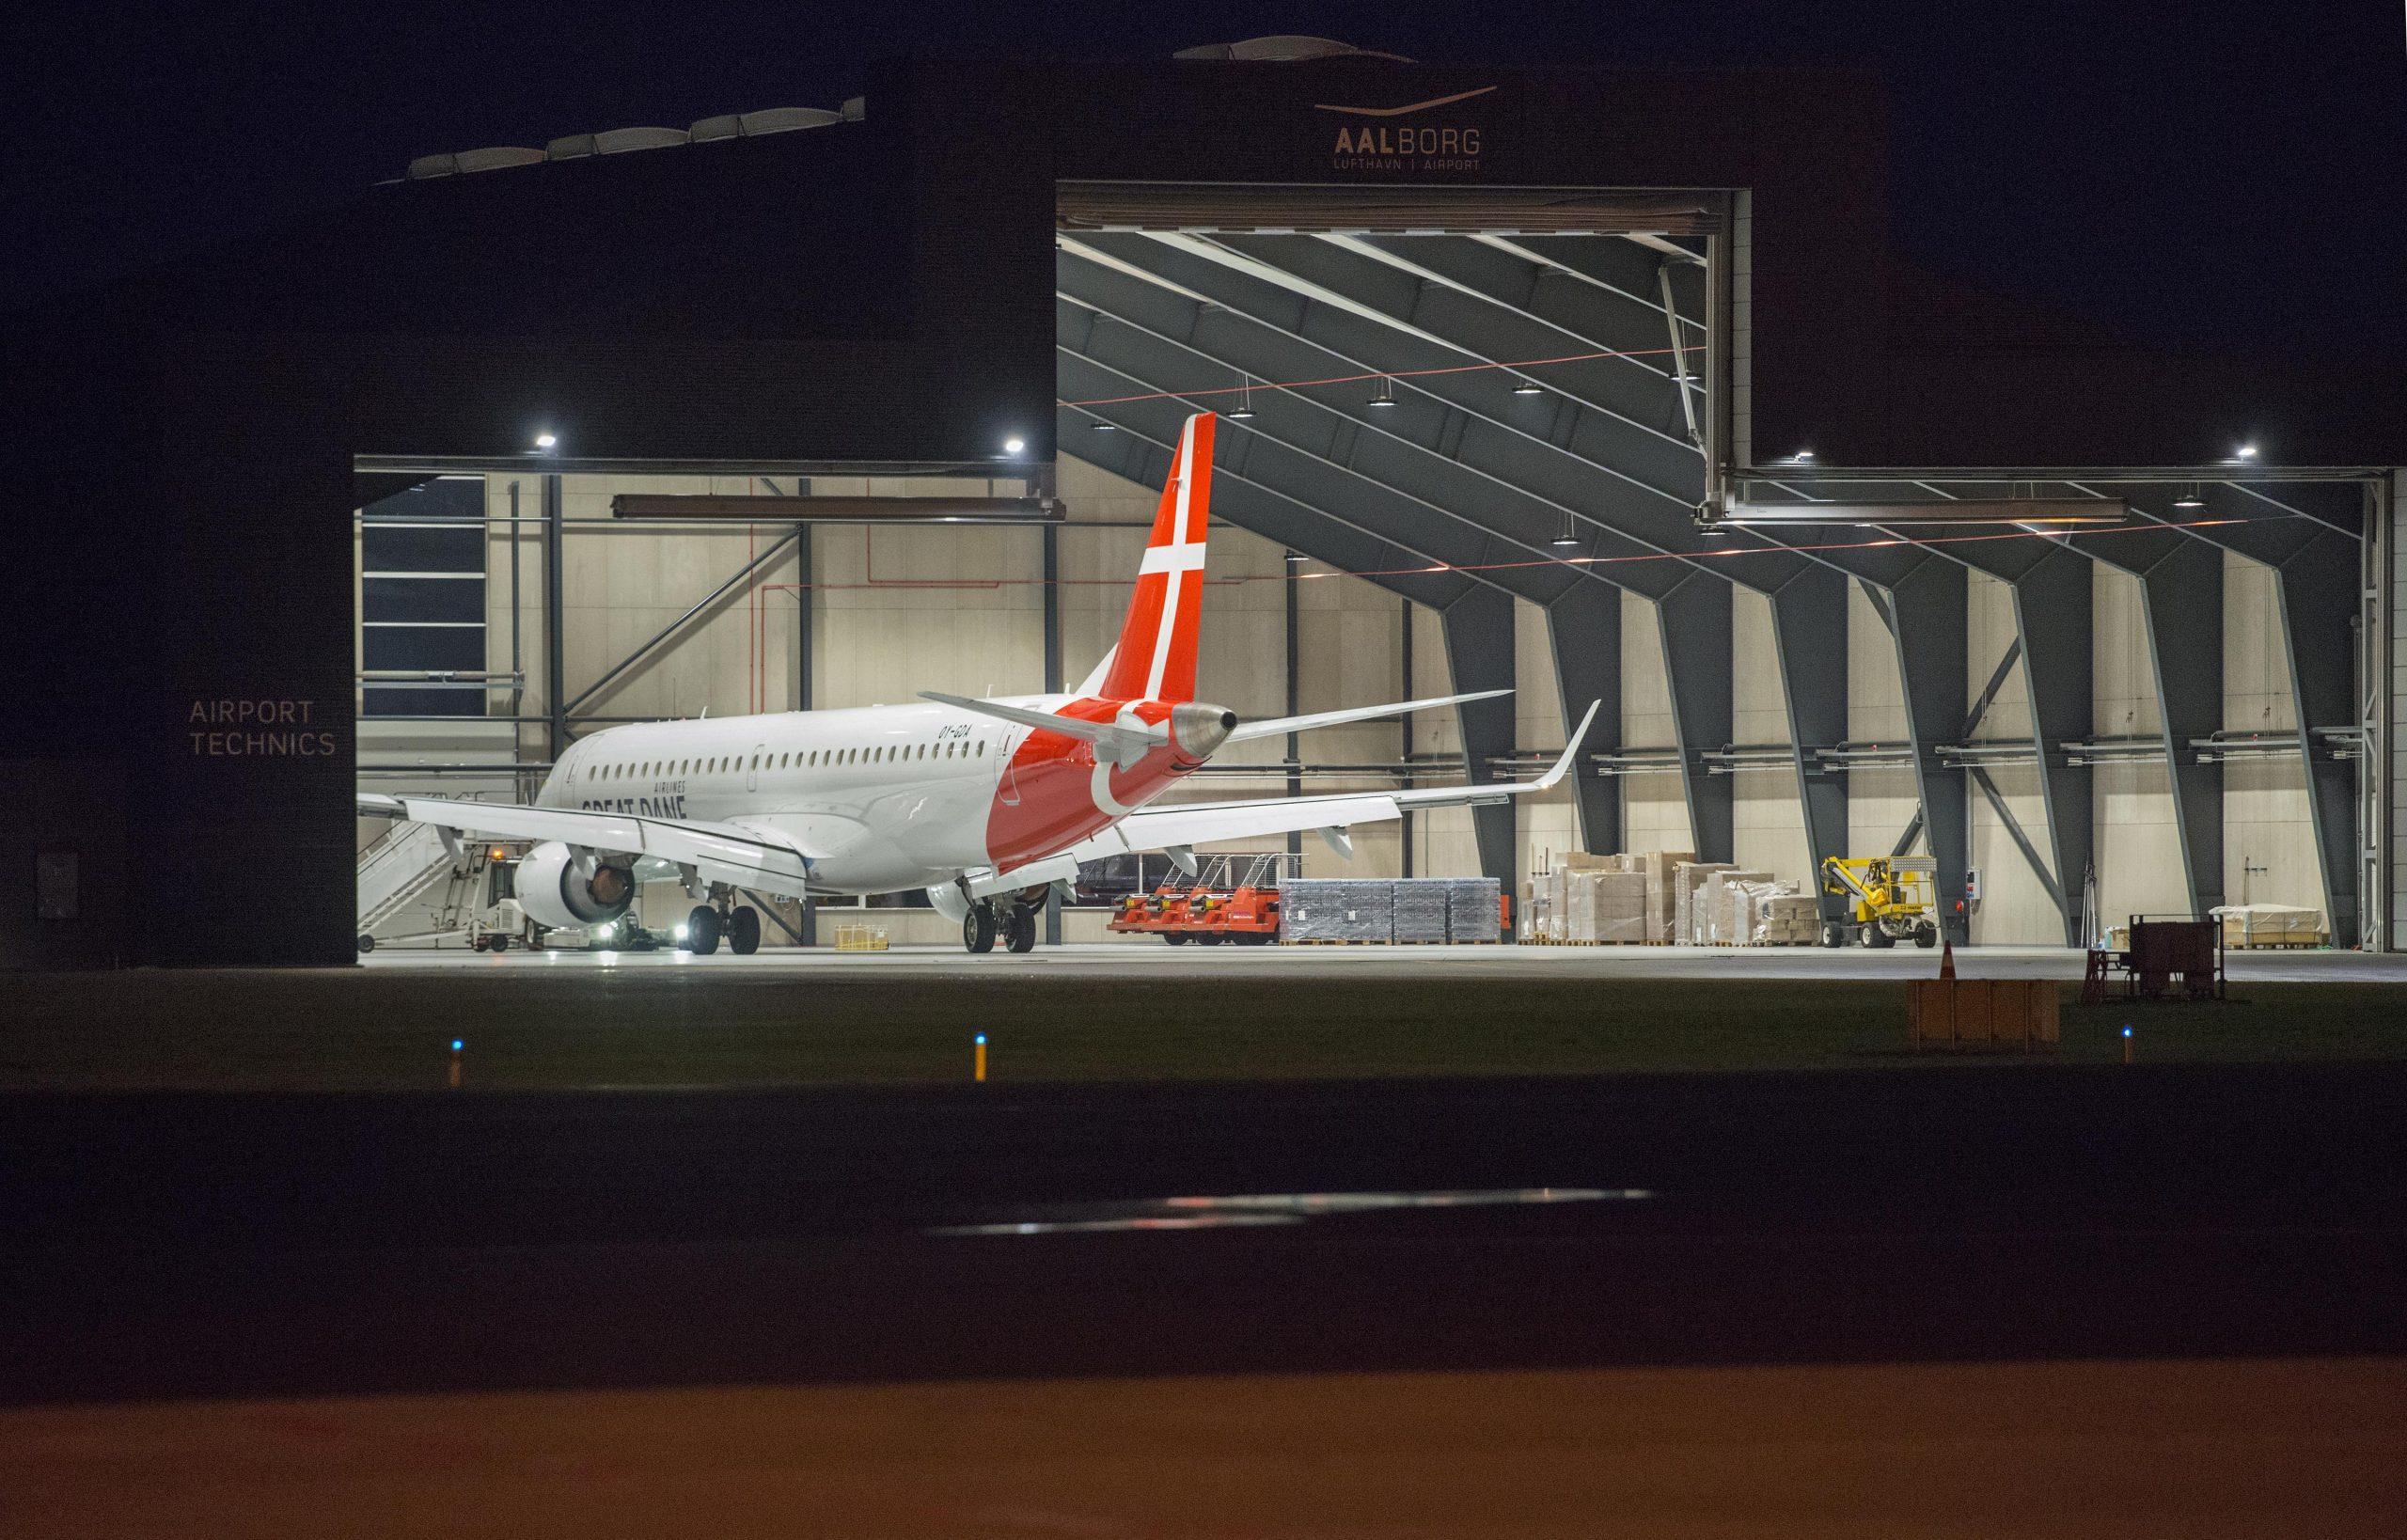 Great Dane Airlines Embraer ERJ 195LR  i hangar i Aalborg Lufthavn. (Foto: Joakim J. Hvistendahl)